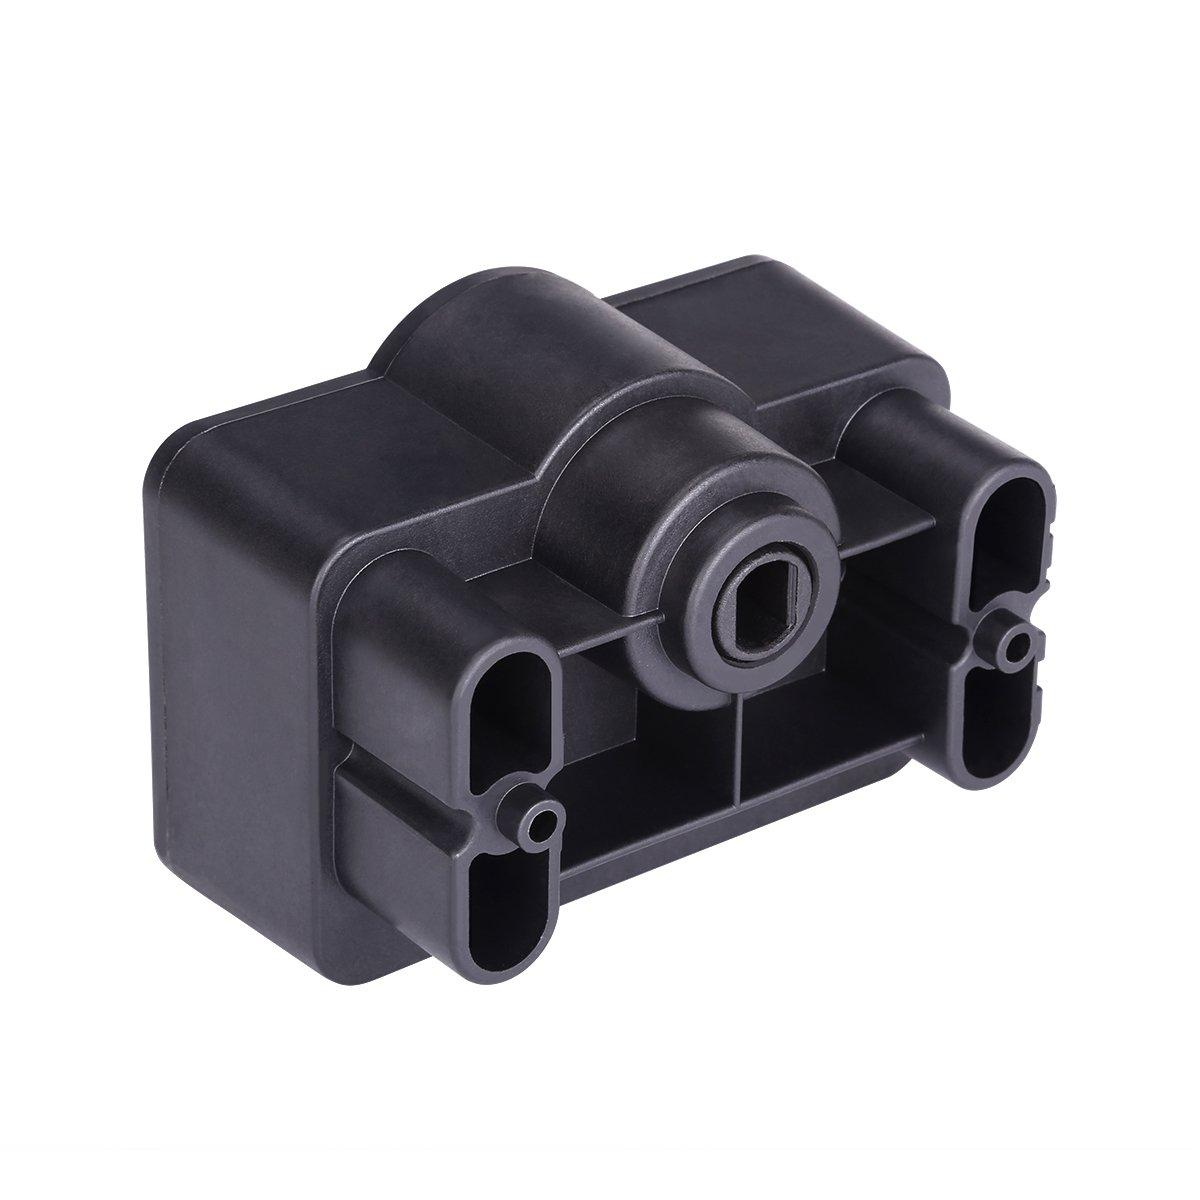 10L0L Club Car MCOR Accelerator Controller Input #103327901, Accelerator for Club Car Precedent Golf Carts (2004-2011) by 10L0L (Image #3)